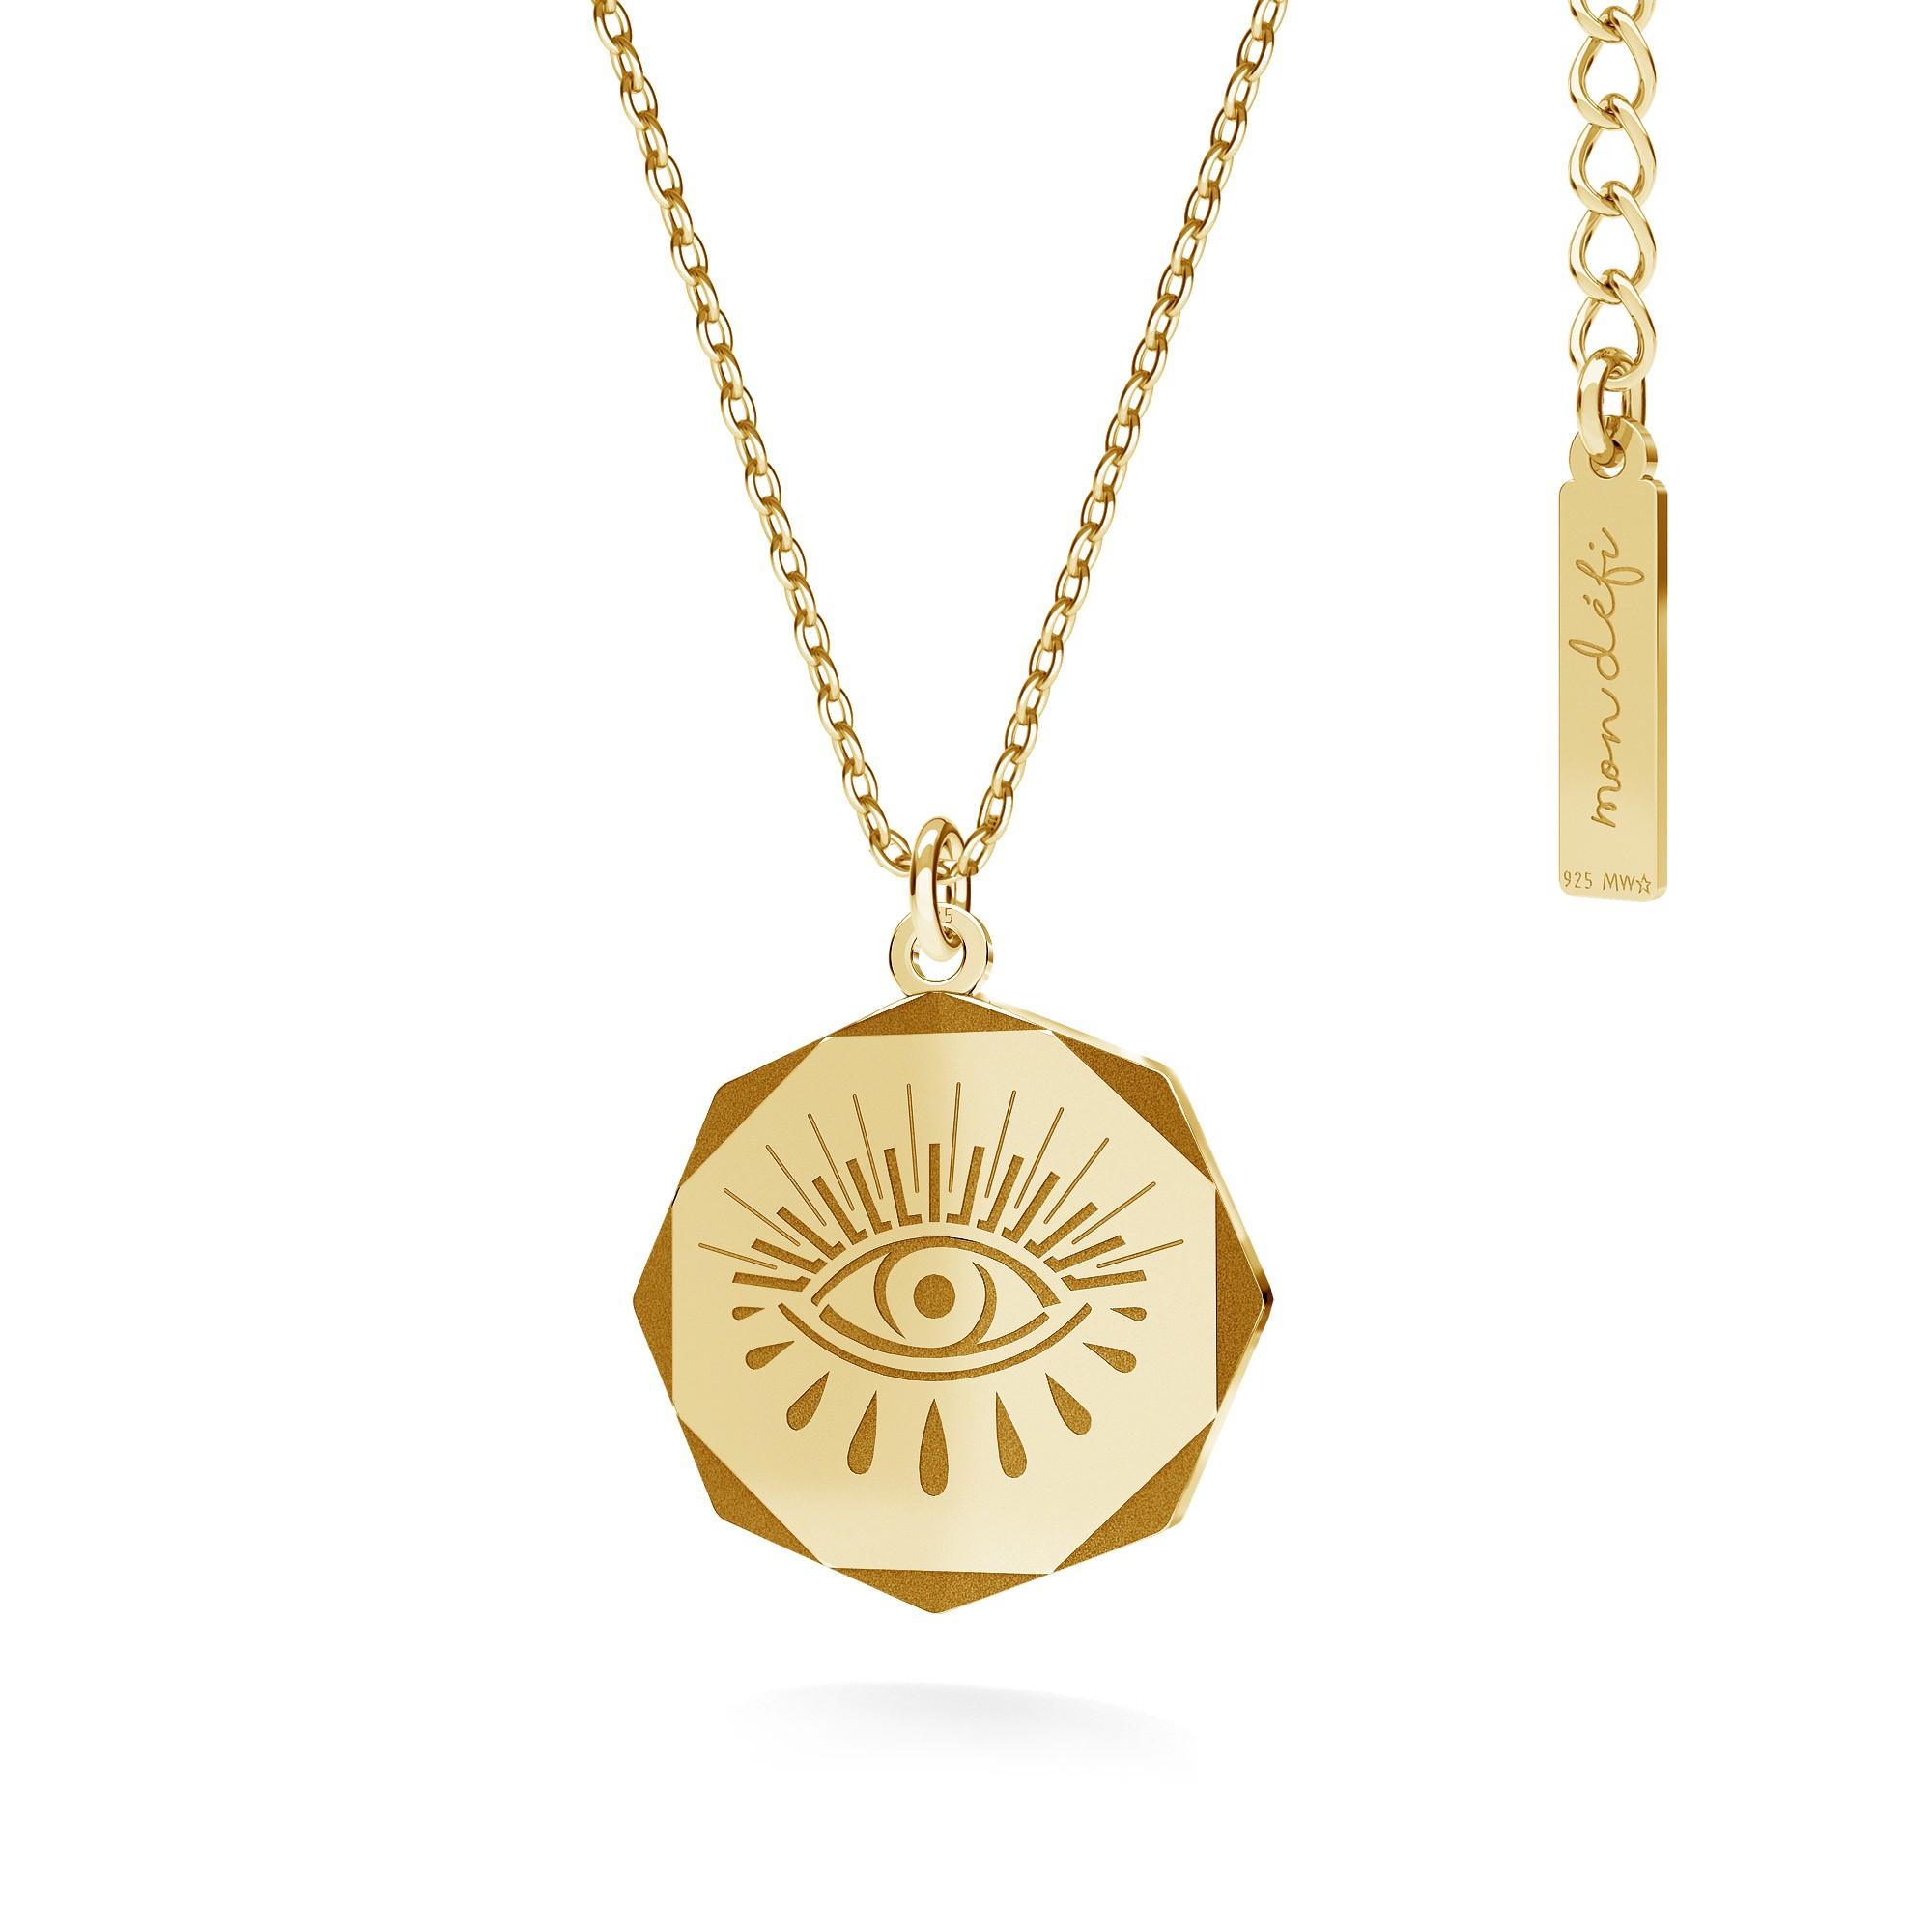 Naszyjnik medalion oko Horusa MON DÉFI srebro 925 - Mon Defi   JestemSlow.pl